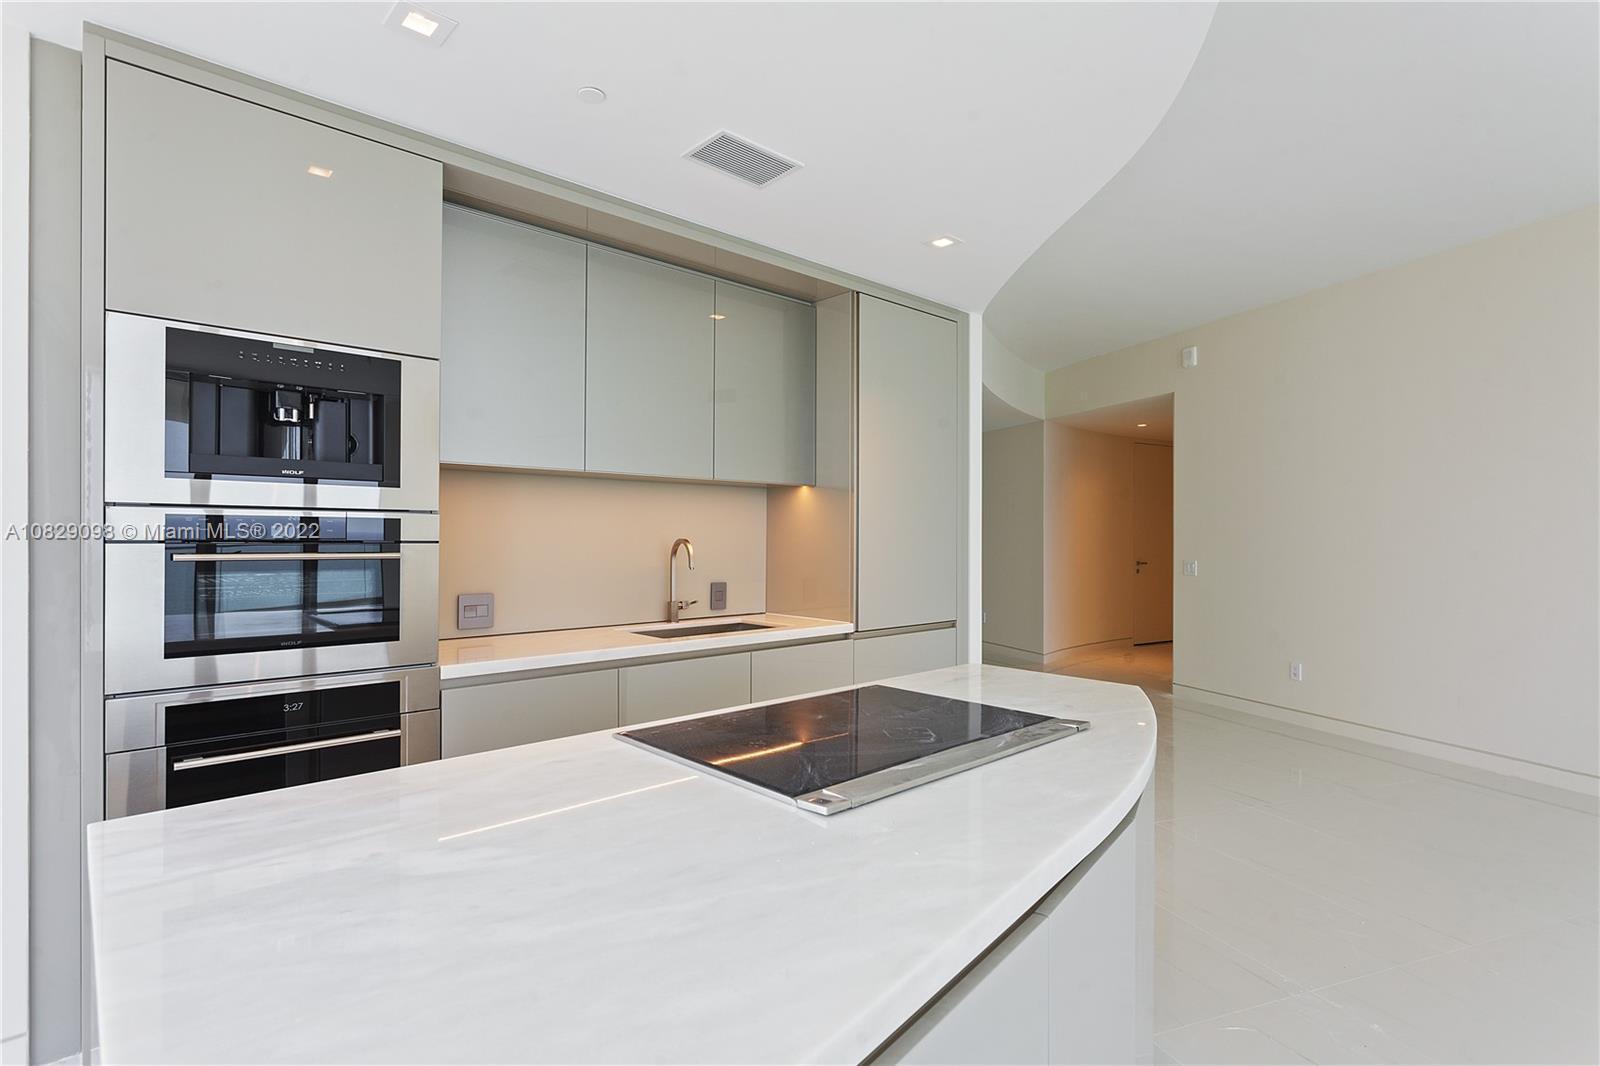 18975 COLLINS AVE, Sunny Isles Beach, Florida